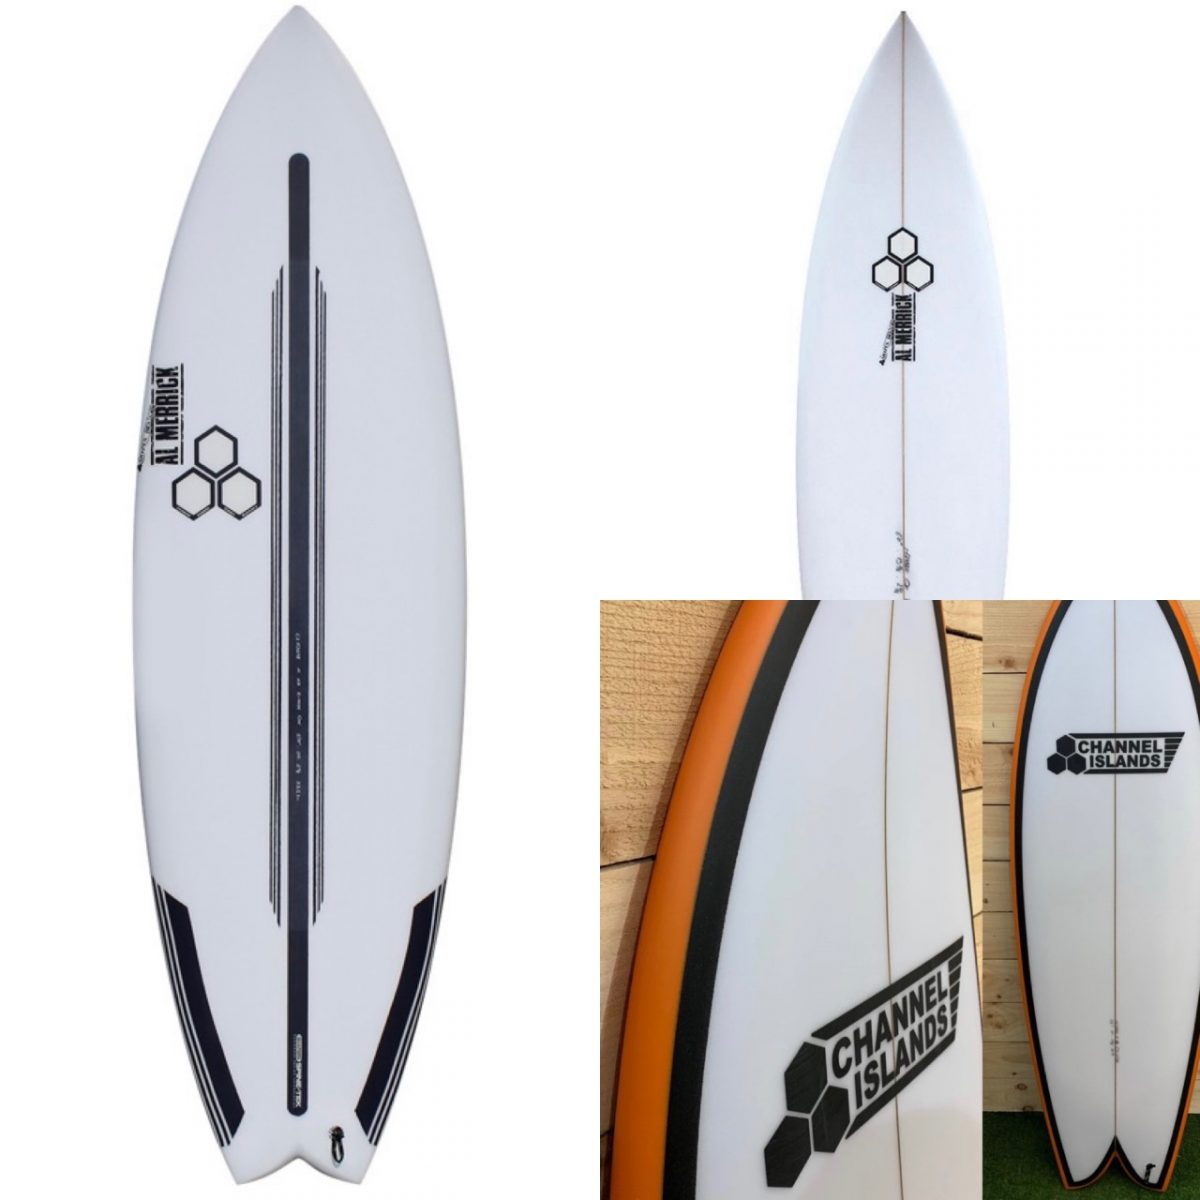 Channel Island Shortboards